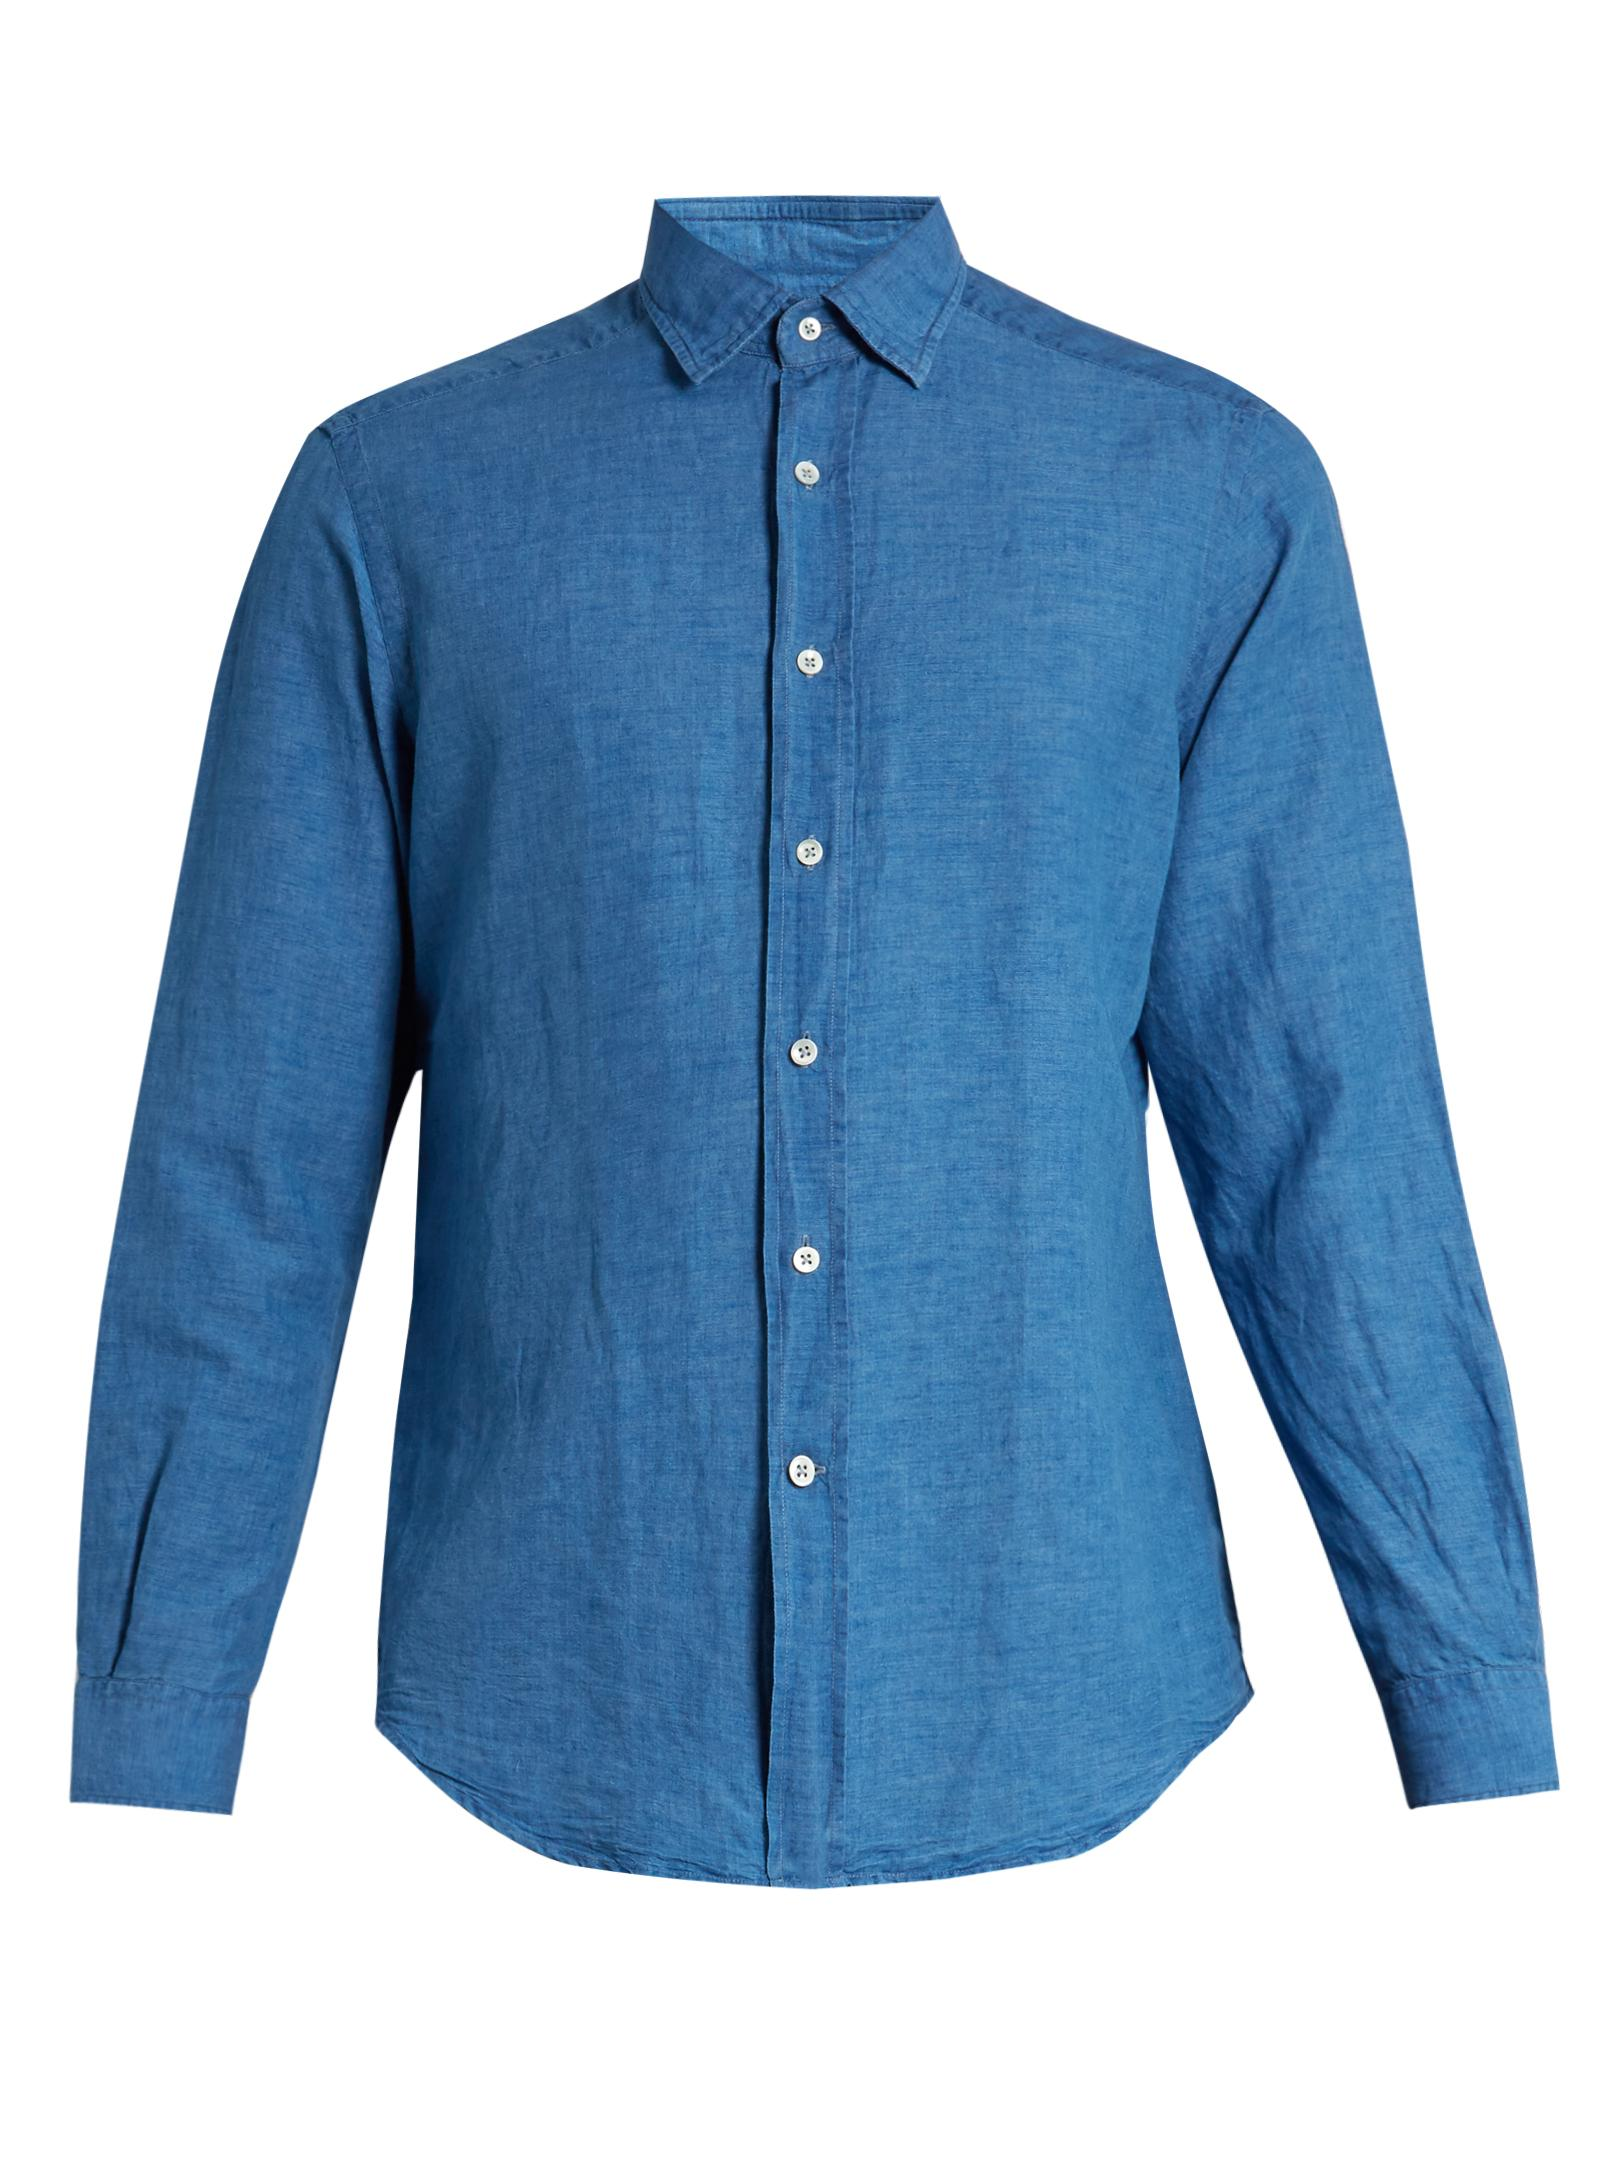 Lyst glanshirt kent chambray shirt in blue for men